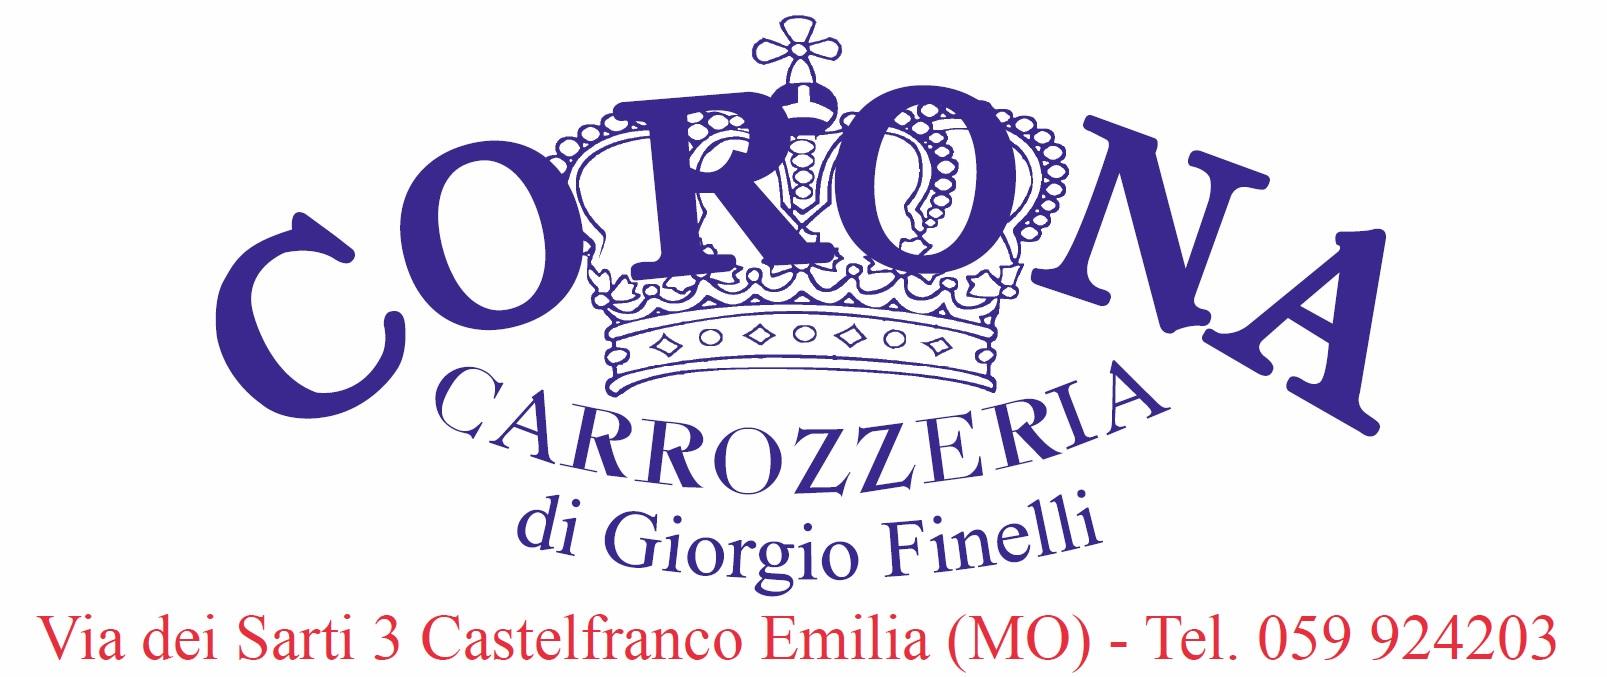 Carrozzeria Corona srl.